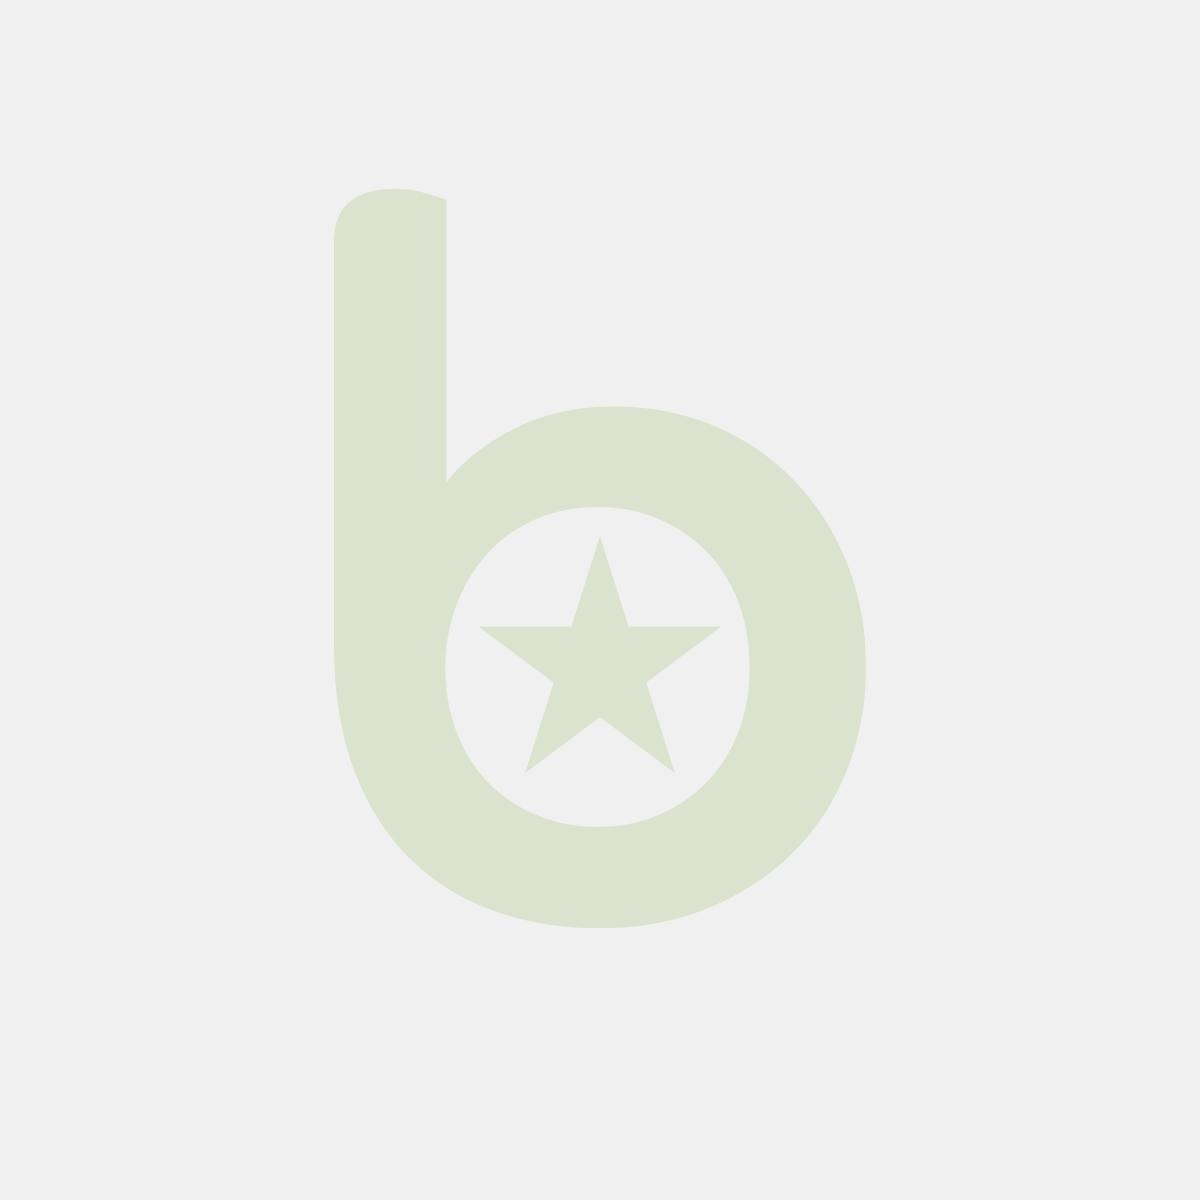 Koperty samoklejące (SK) NC, 25 sztuk, białe, C6, 11021000